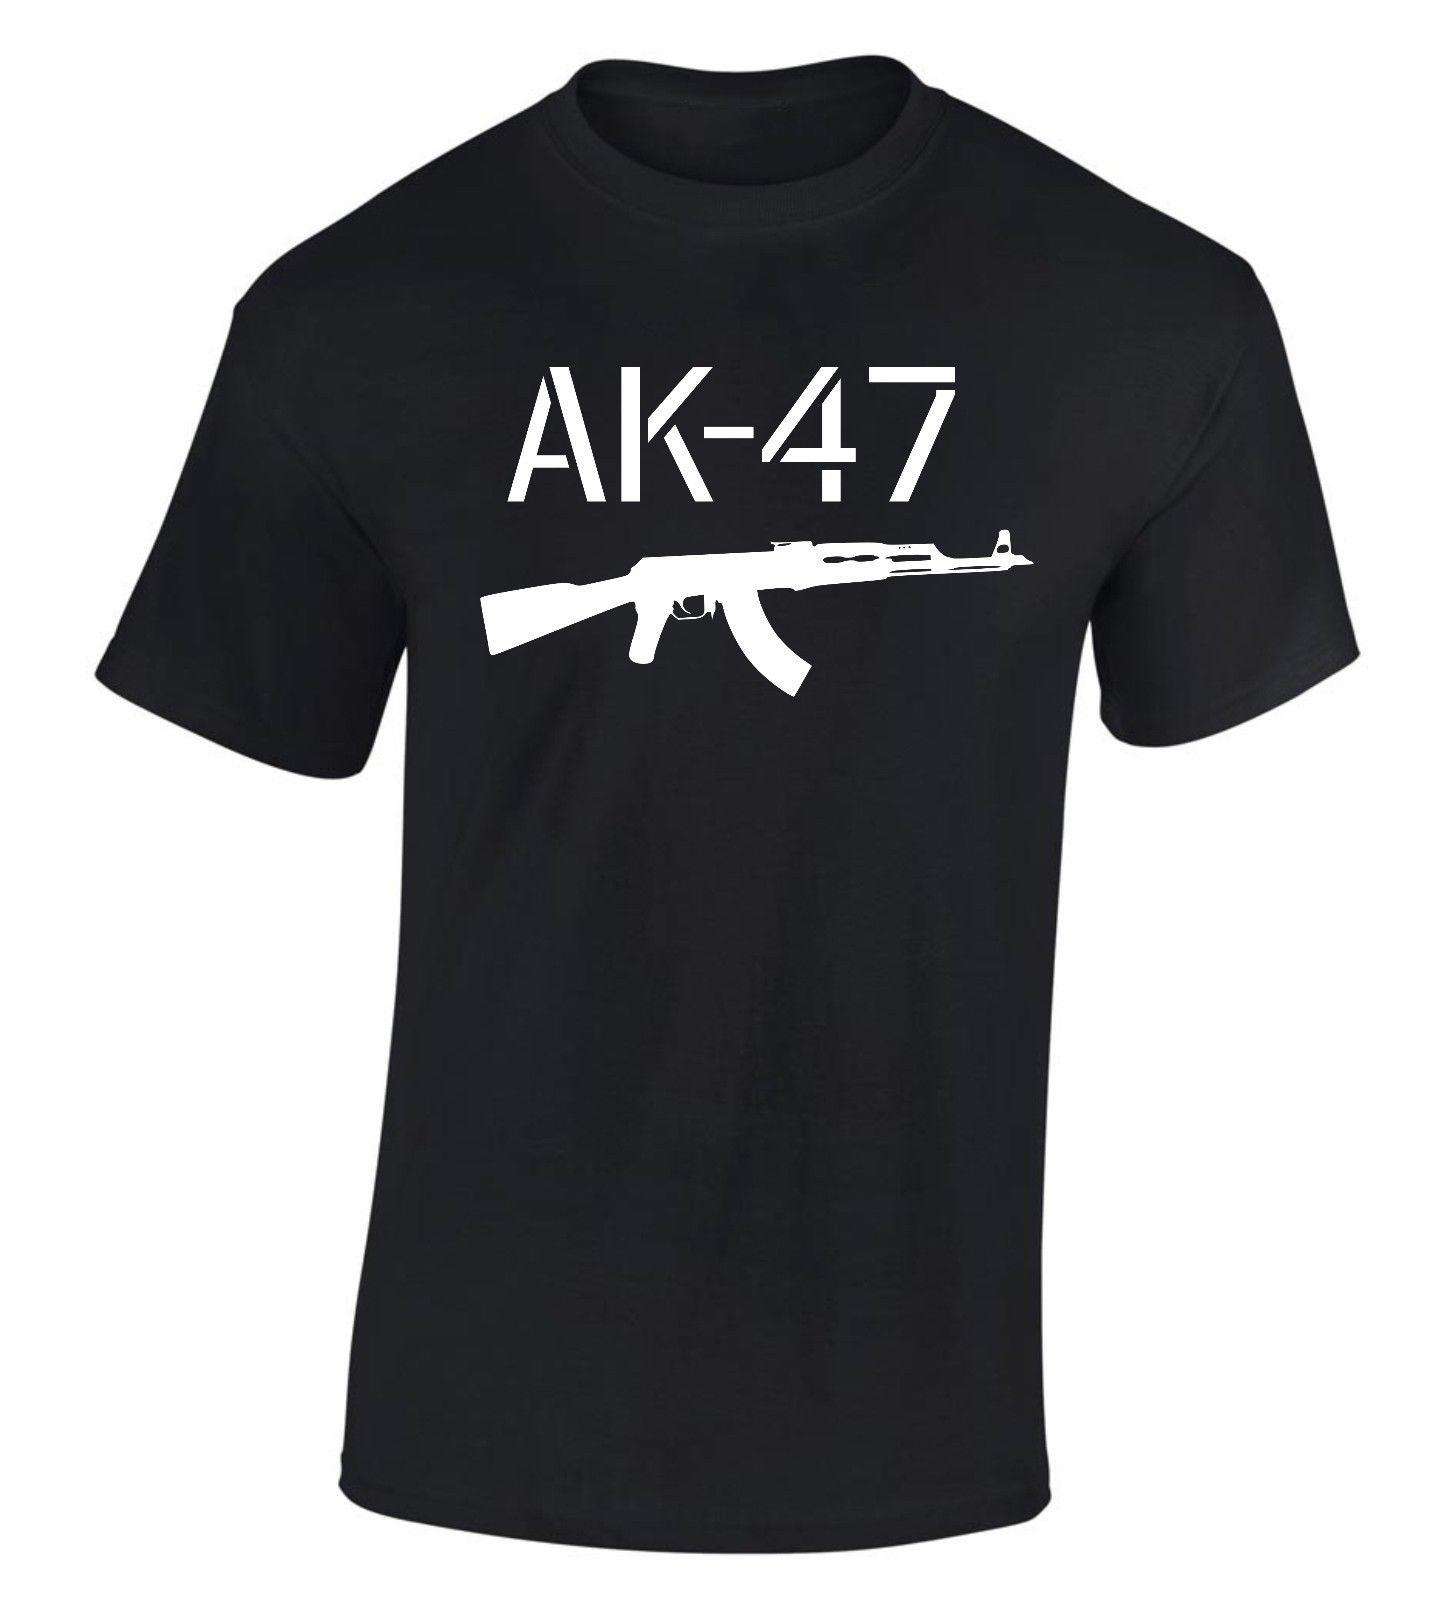 Großhandel Ak 47 Kalashnikov Ak47 T Shirt Russia S Xxxl Kostenloser